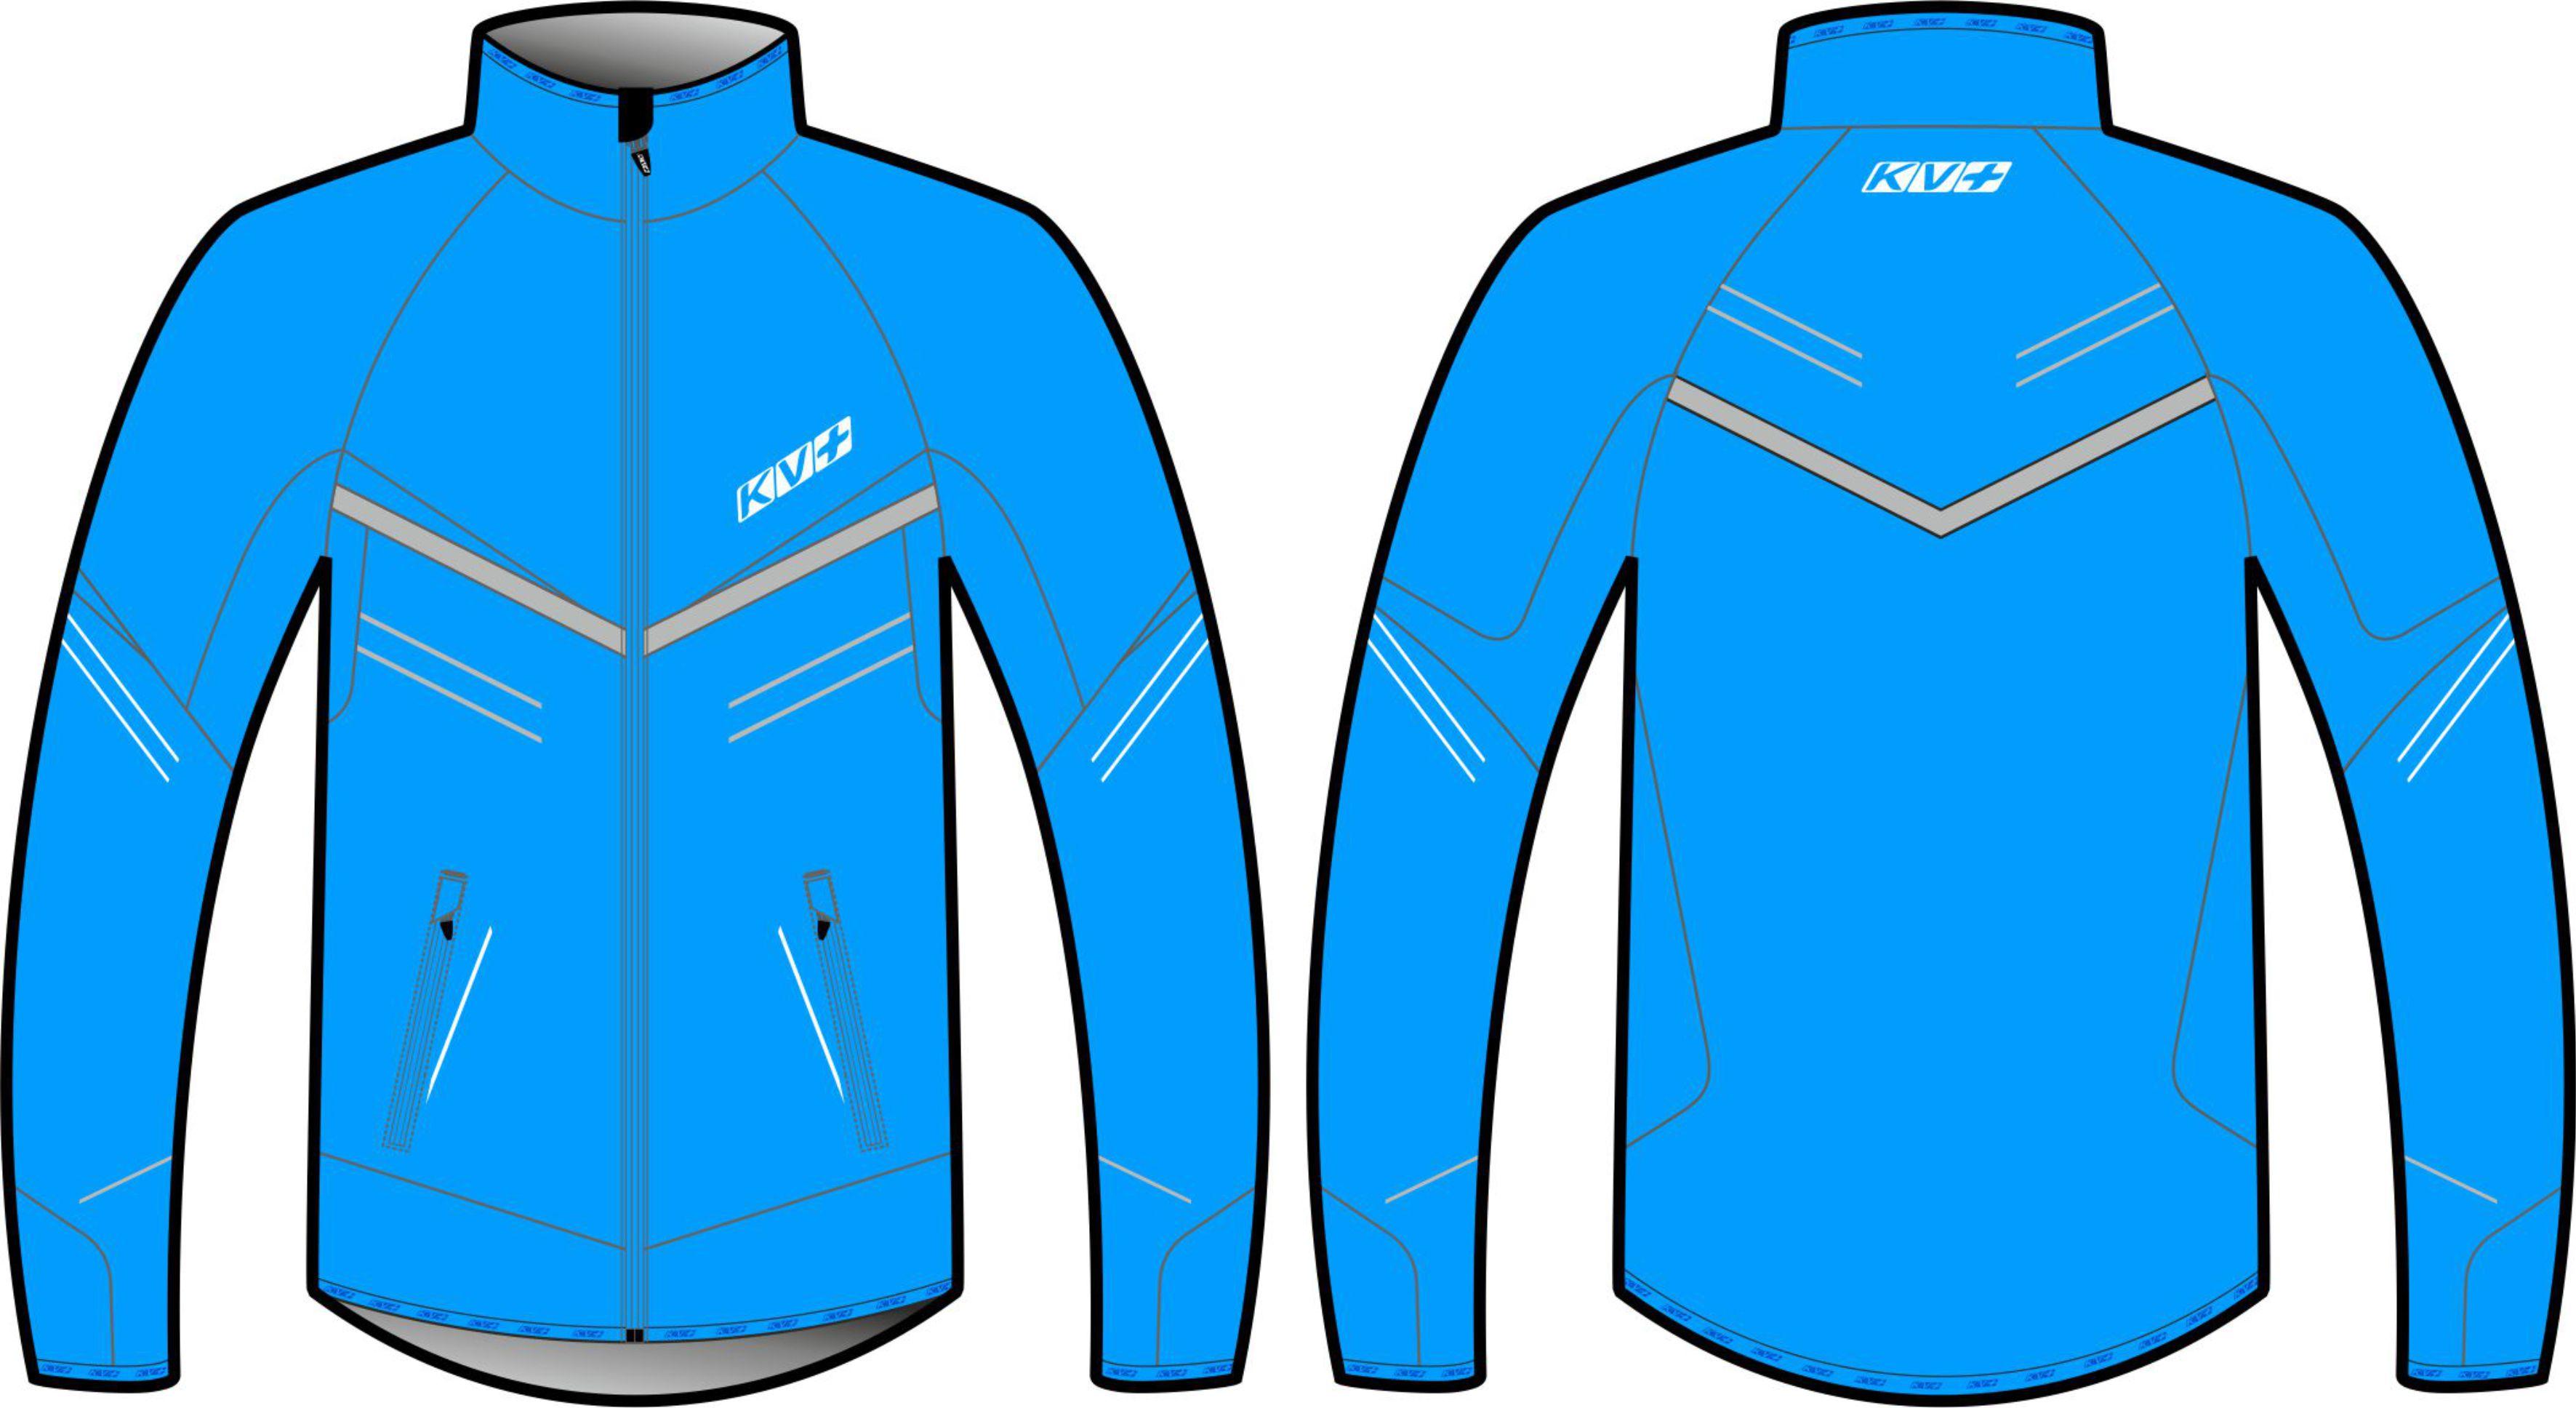 PREMIUM JACKET UNISEX (blue)